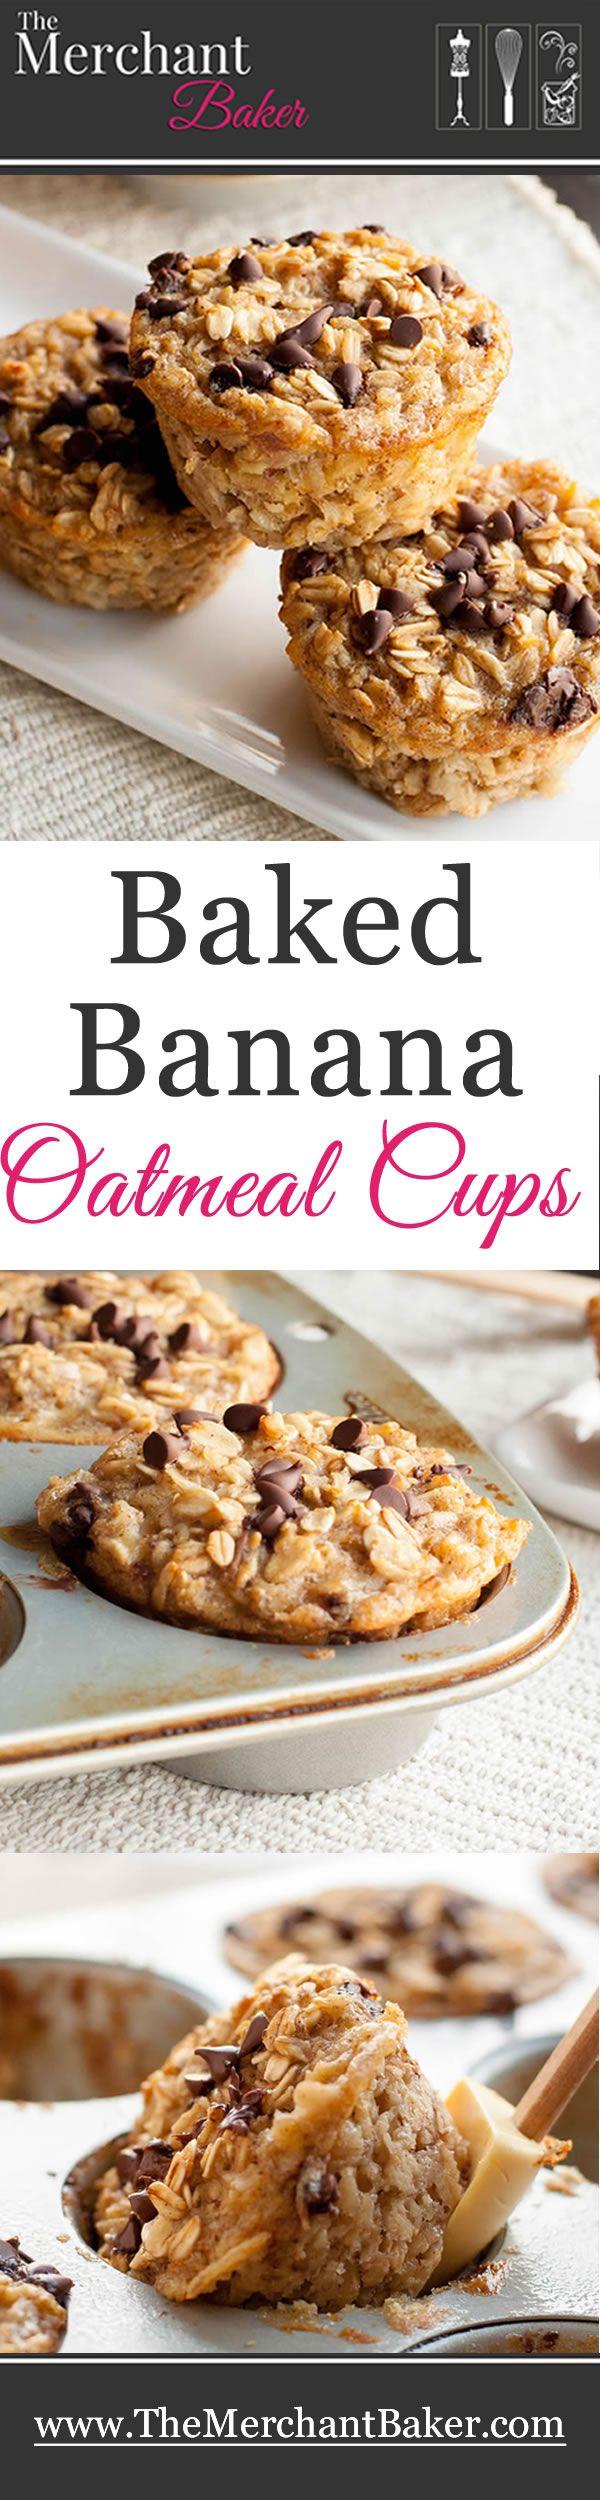 Baked Banana Oatmeal Cups